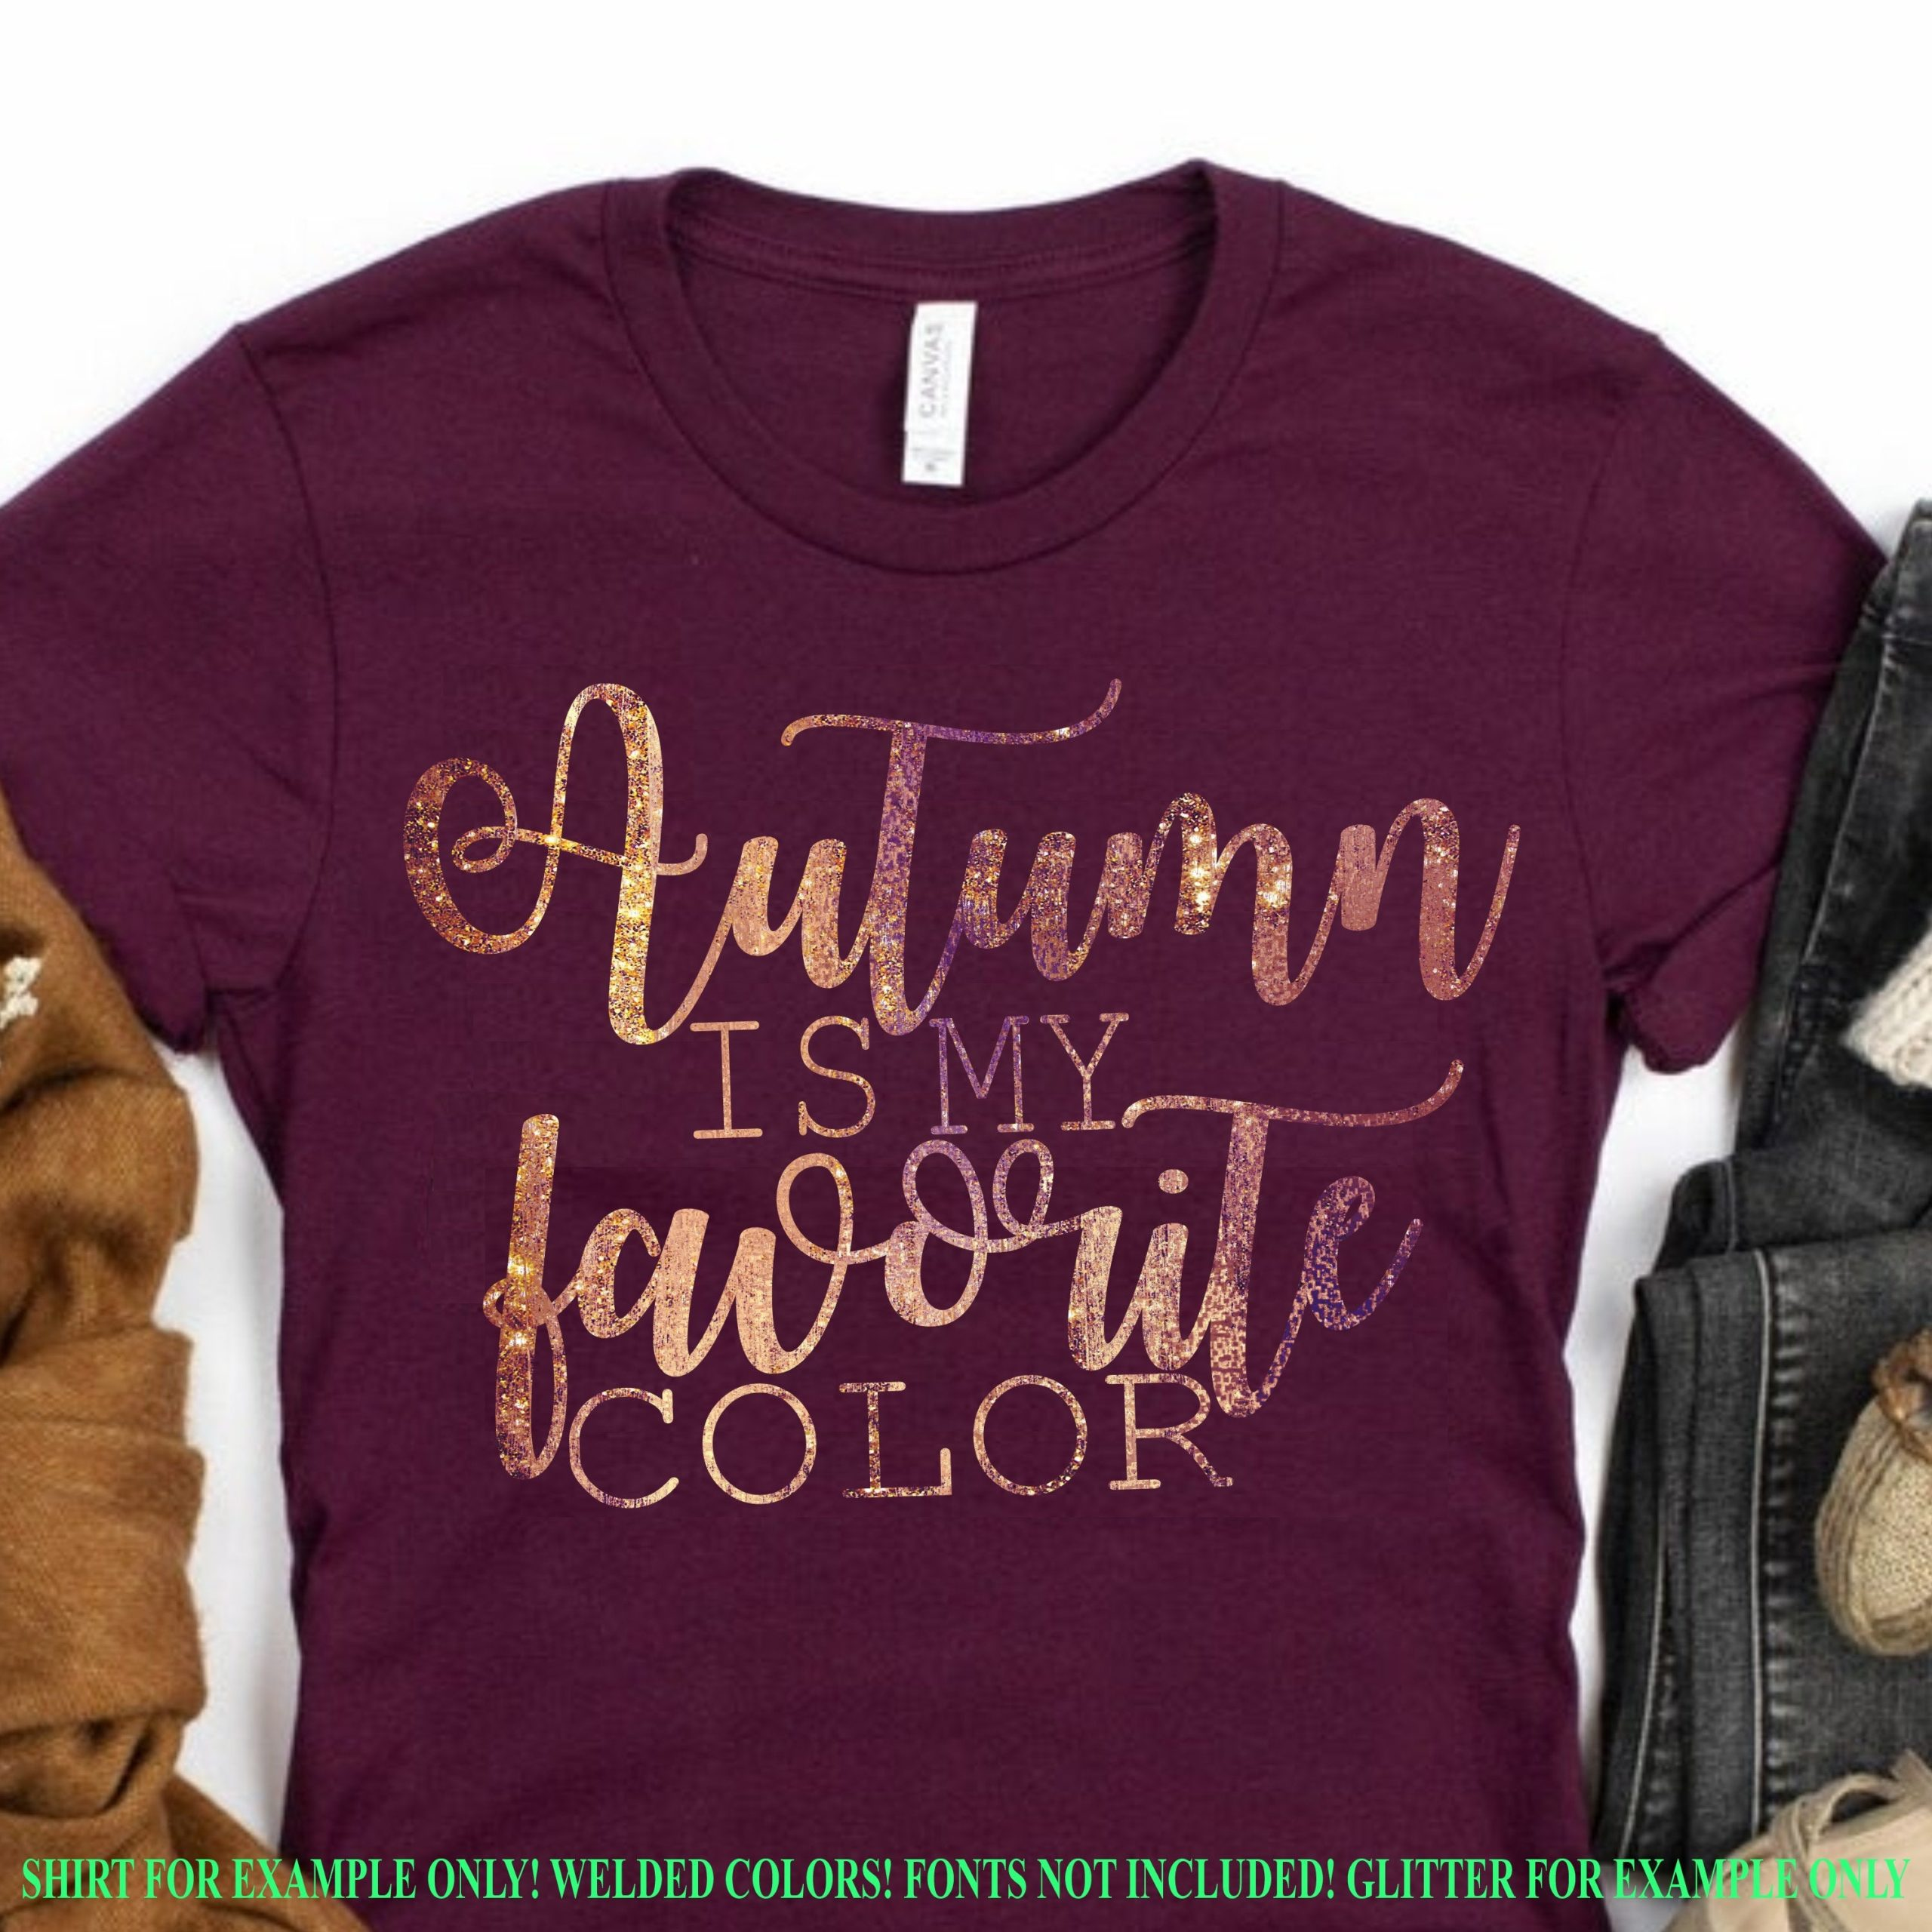 Autumn-is-my-favorite-svg-fall-svg-autumn-svg-fall-sayingsfall-svg-designsfall-cut-filescricut-fall-designscricut-svgsvg-for-mobile-5f6f7162